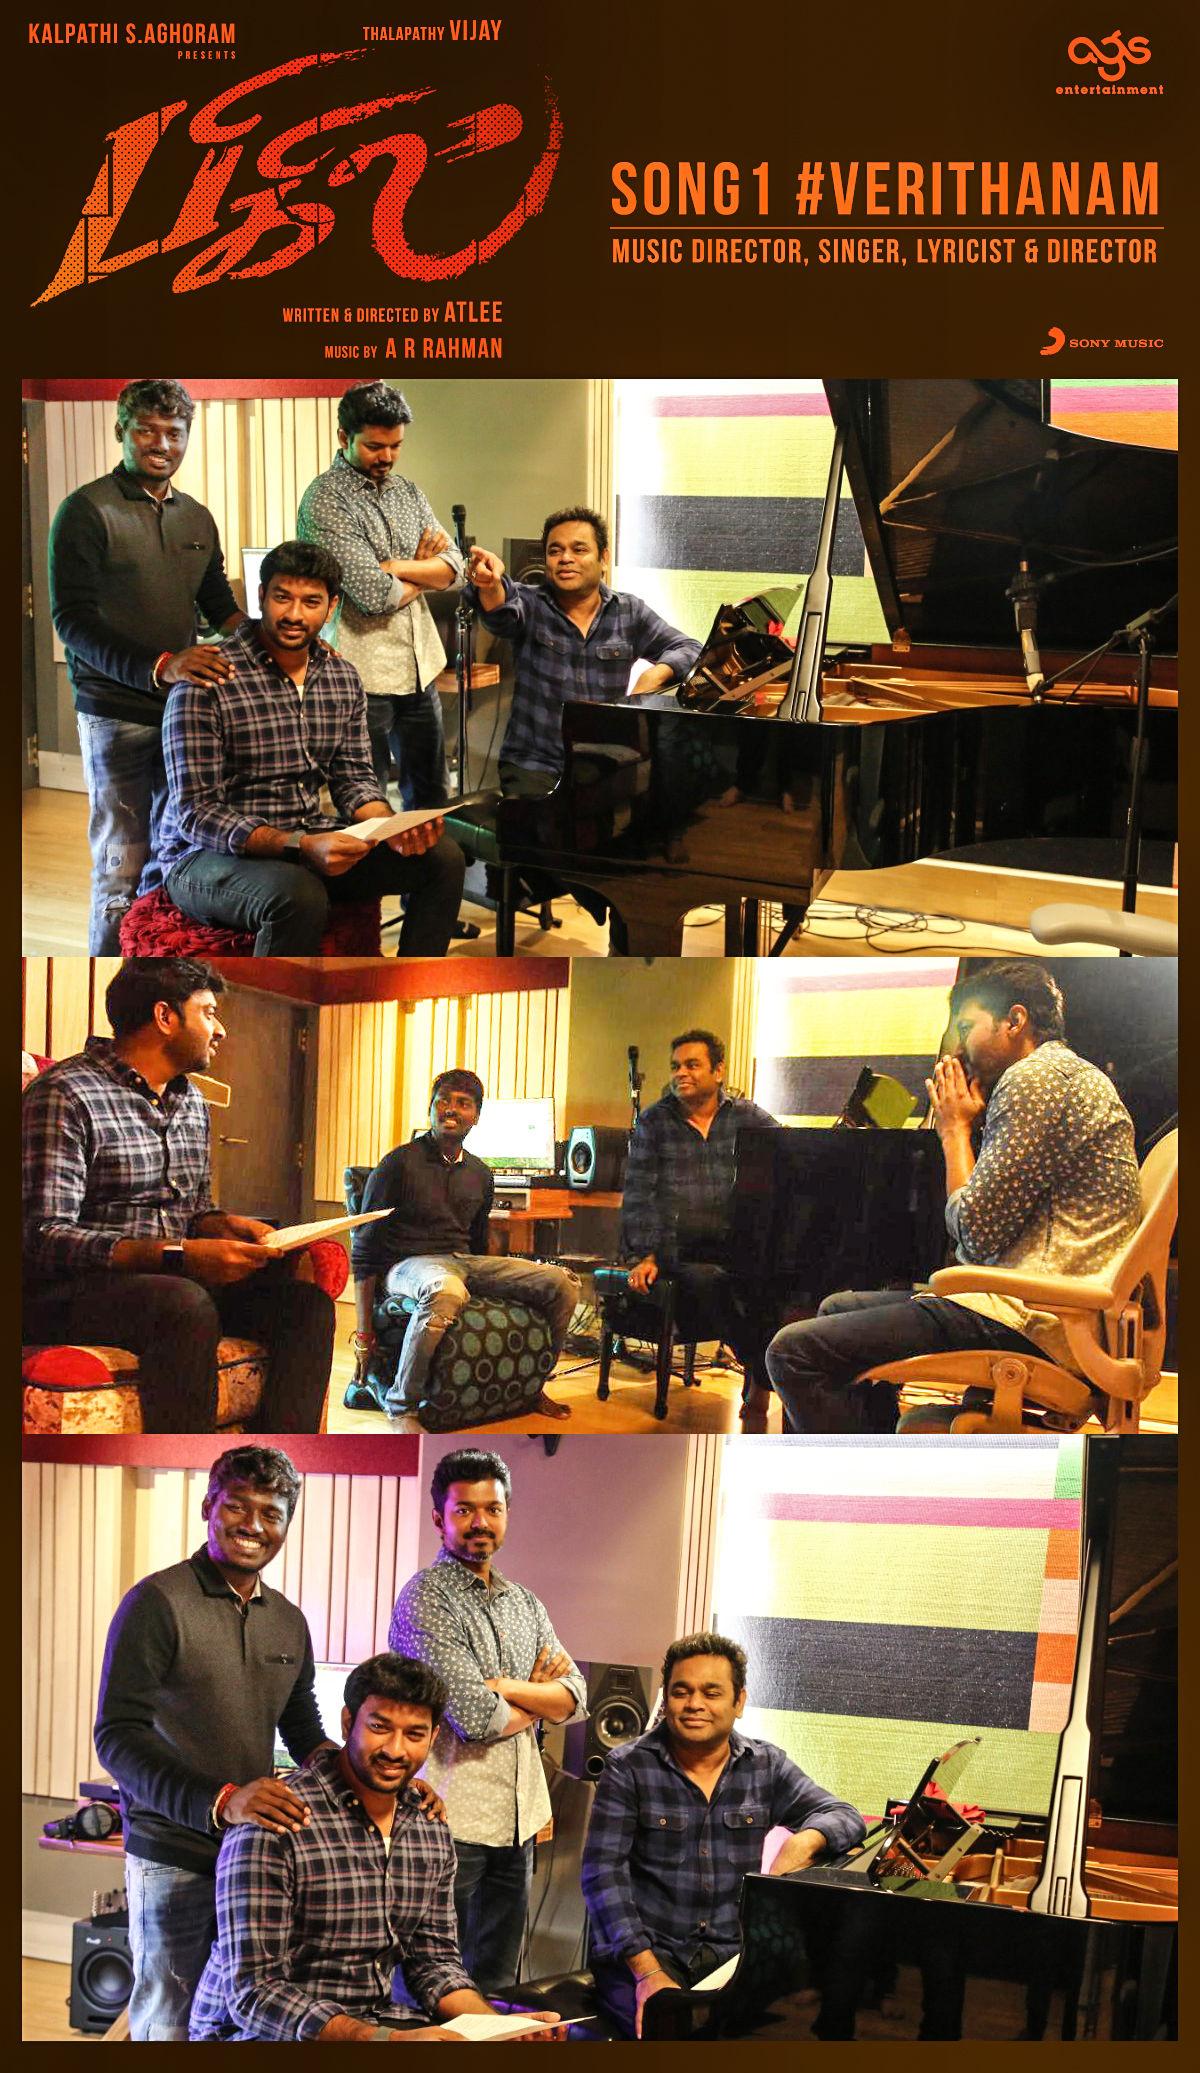 Bigil Movie 1st Track Verithanam Sings By Thalapathy Vijay